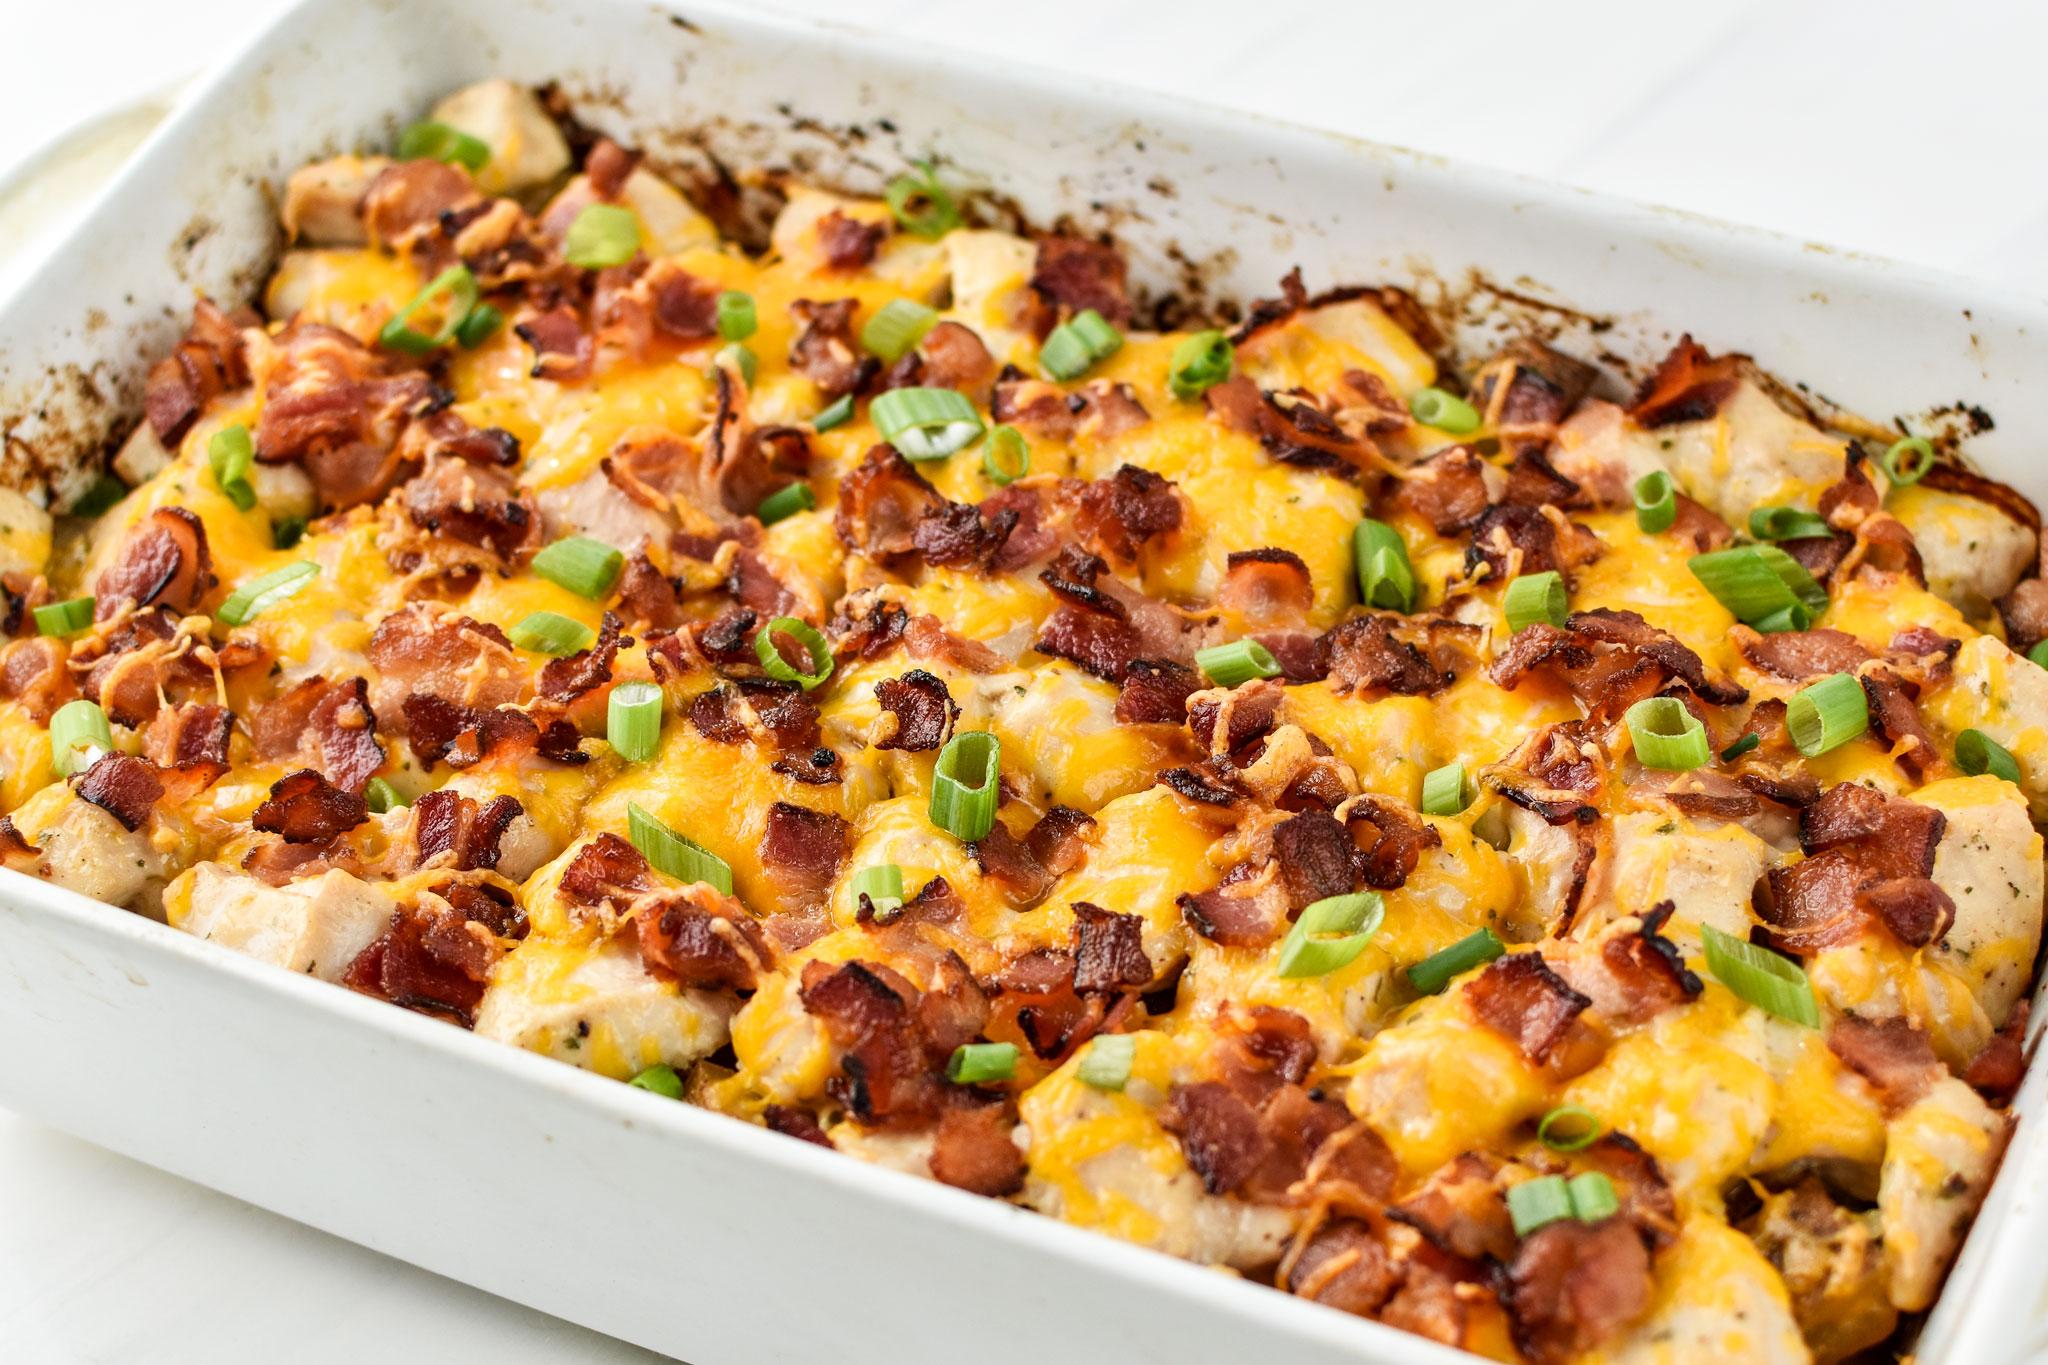 Chicken bacon ranch potato bake fresh from the oven